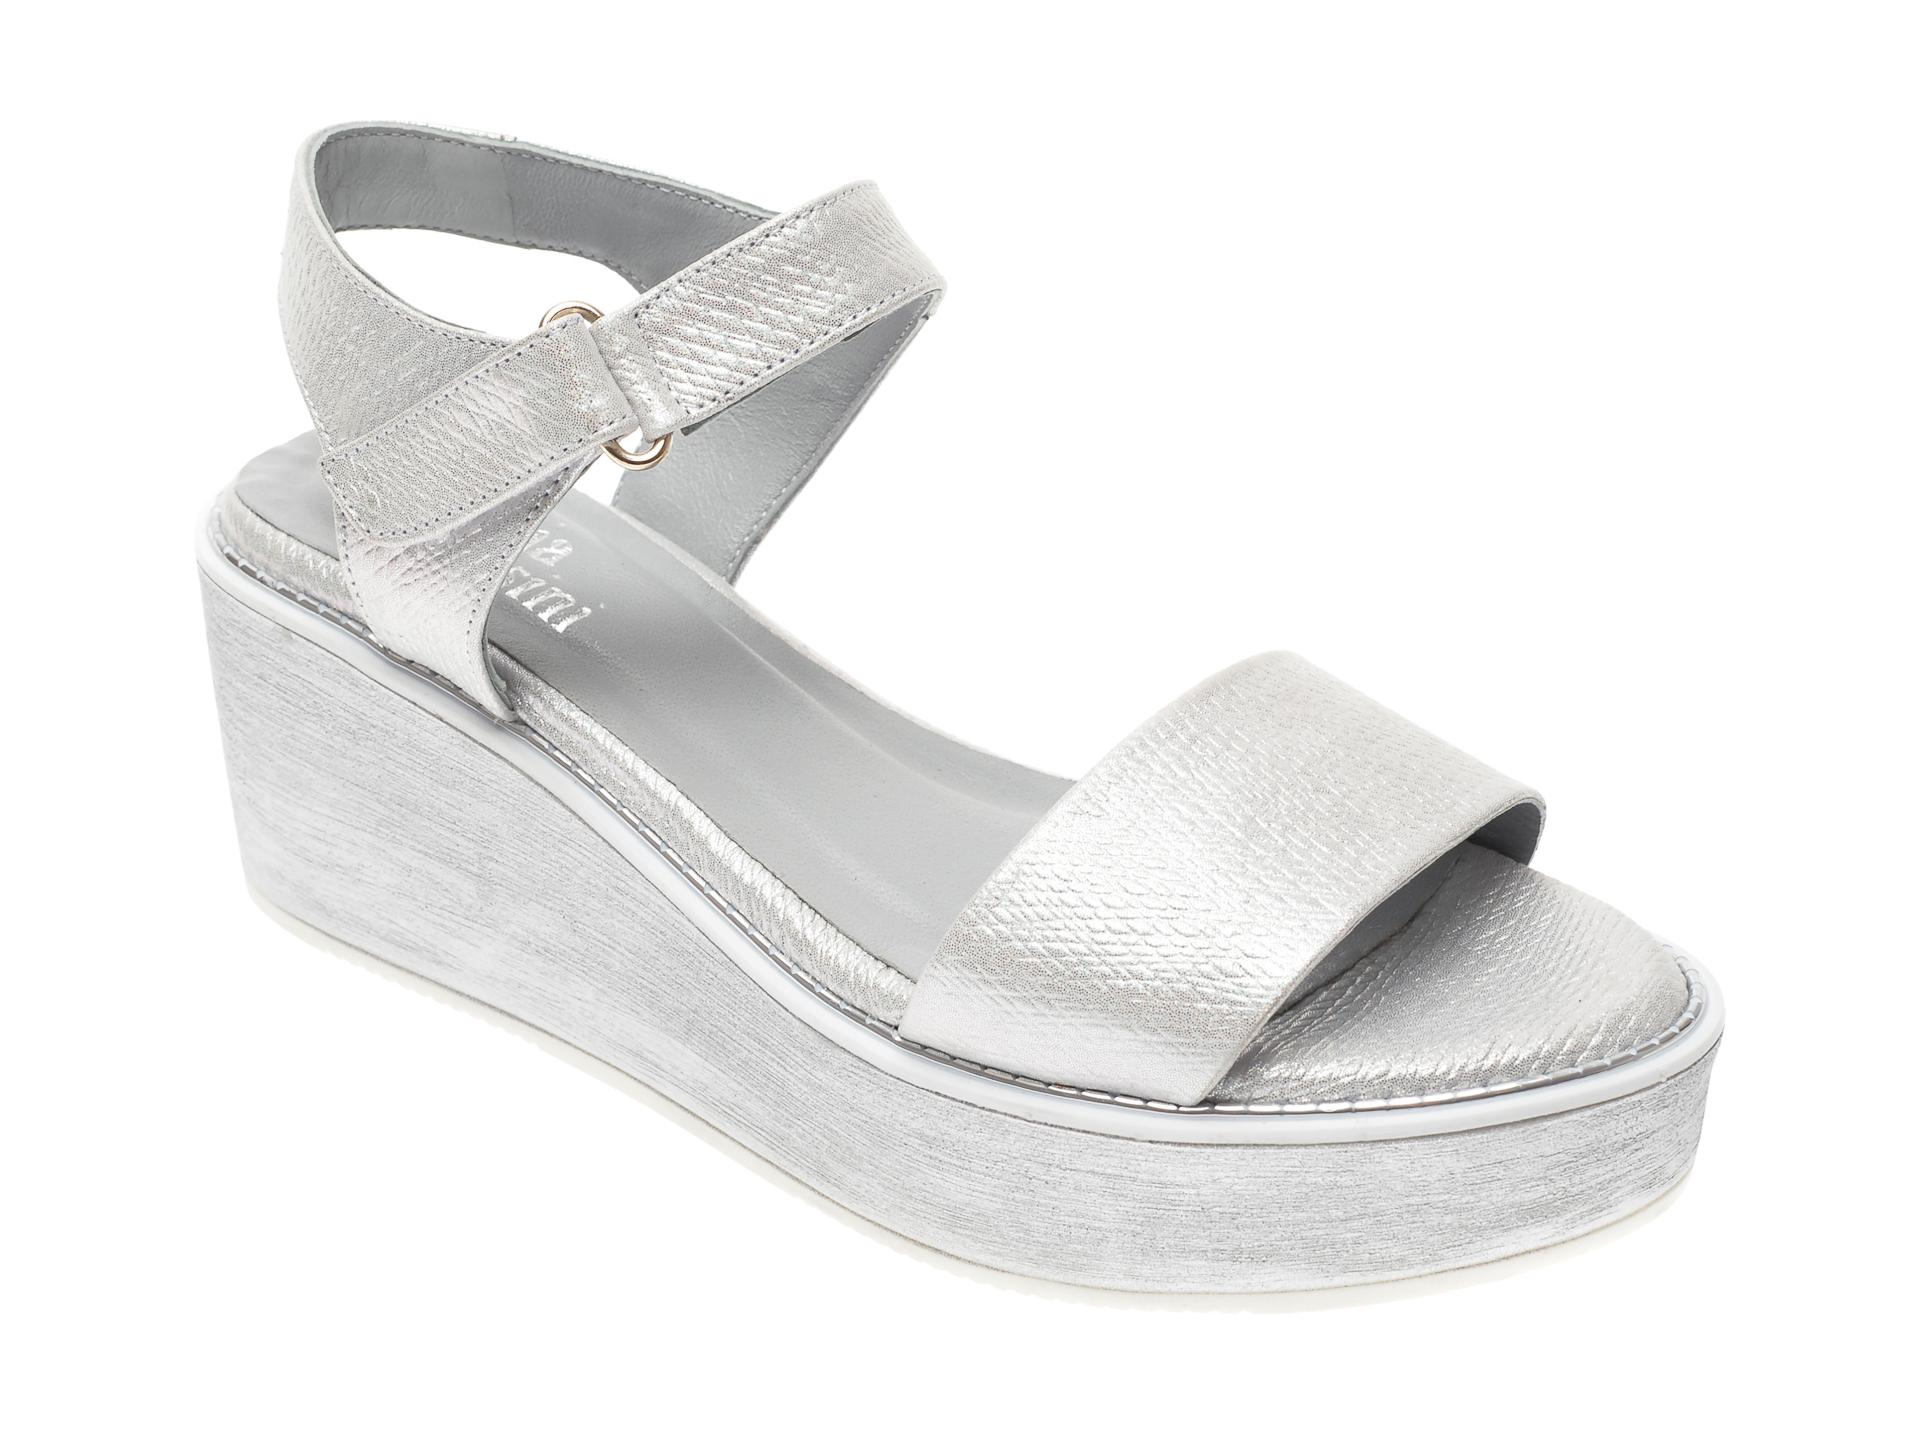 Sandale FLAVIA PASSINI argintii, 887, din piele naturala imagine